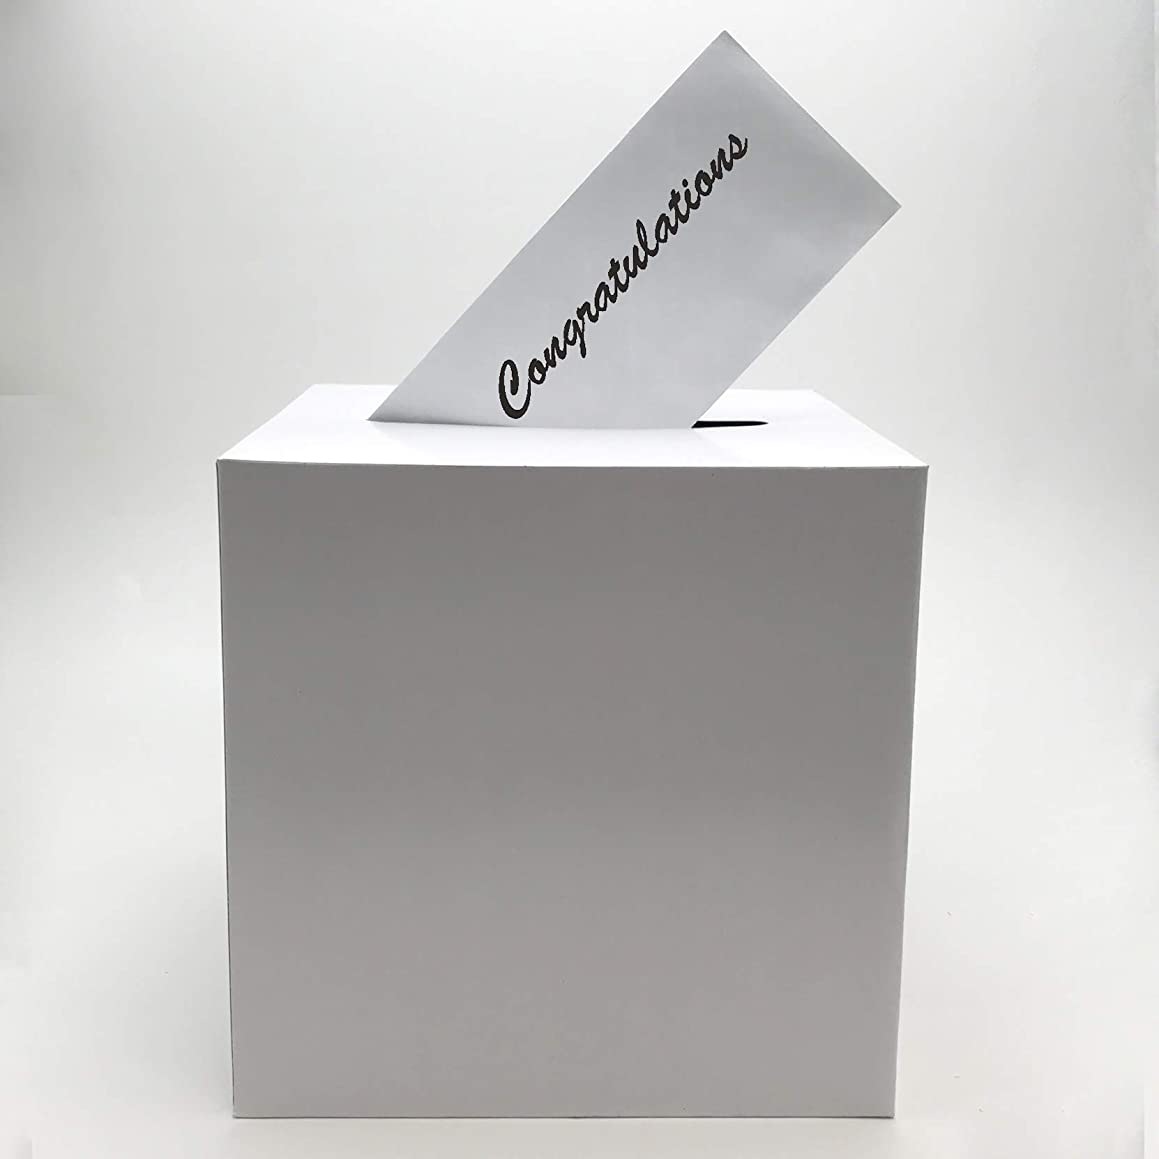 Adorox White Wishing Well Wedding Money Box Memory Cards Reception Centerpiece Box (1 Pc Box)